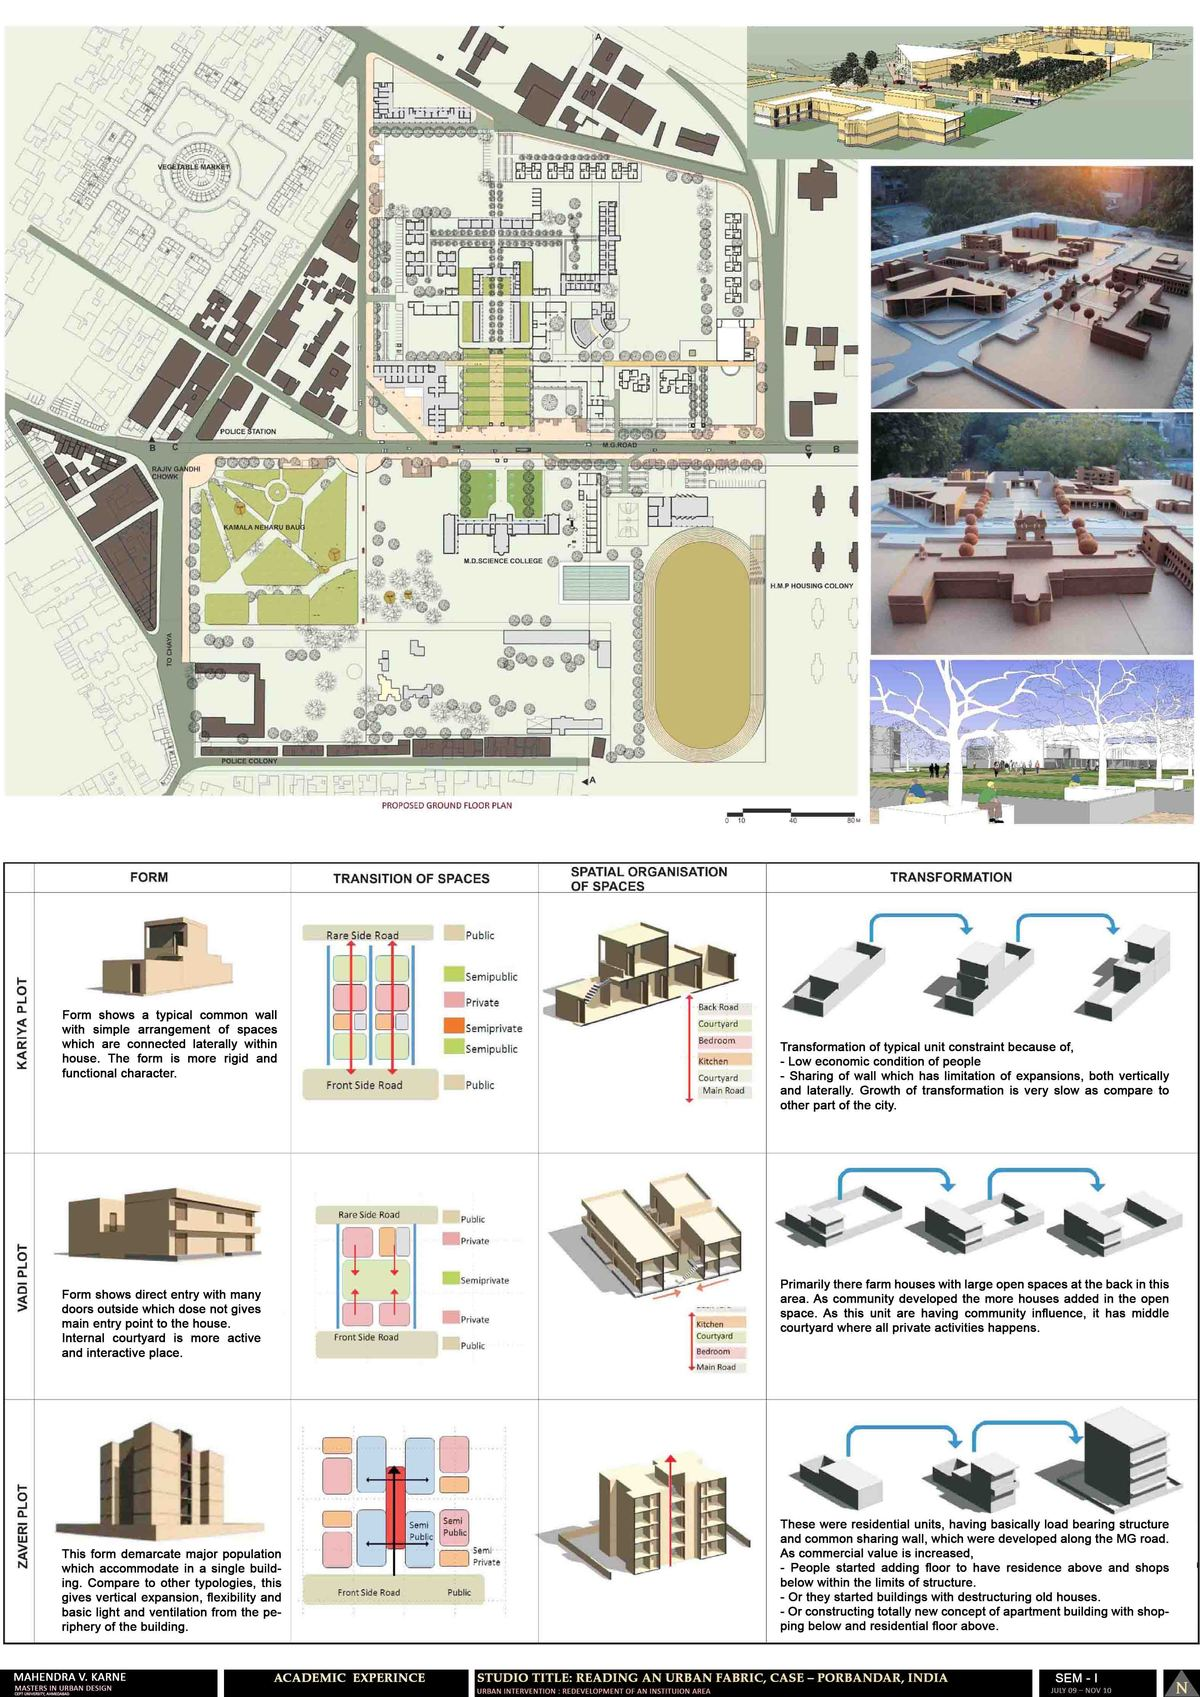 Academic experience-Porbandar City (India) 2/2